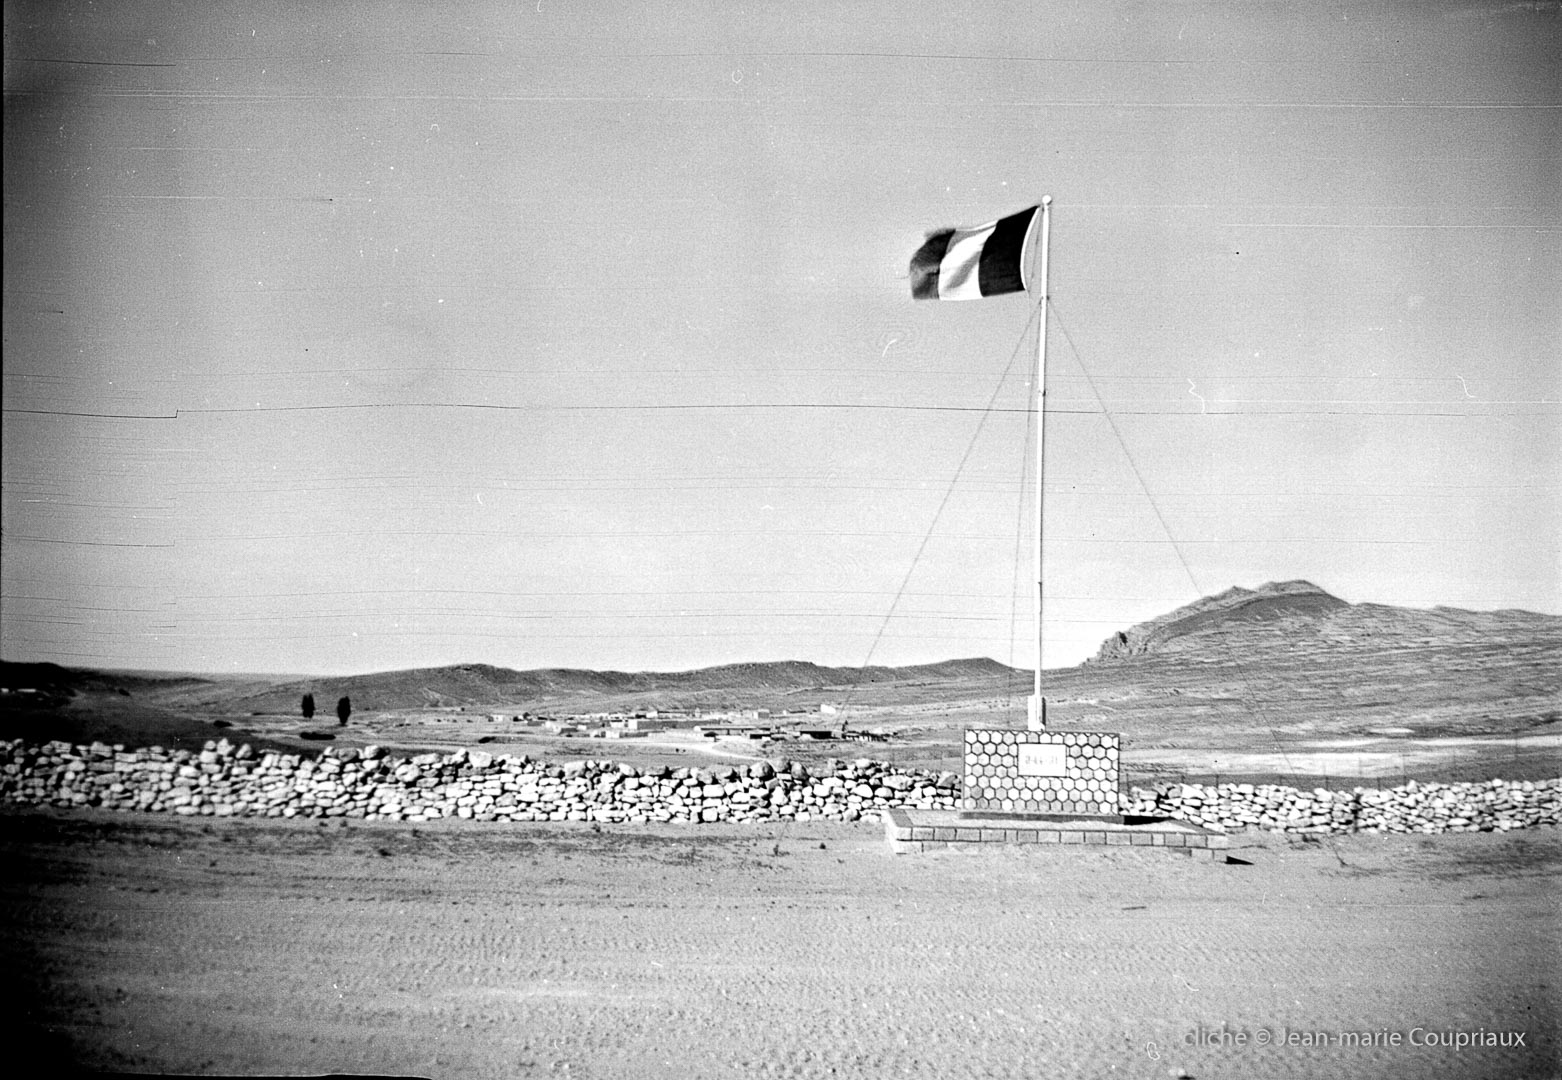 112-Algérie-BirElAter-1957